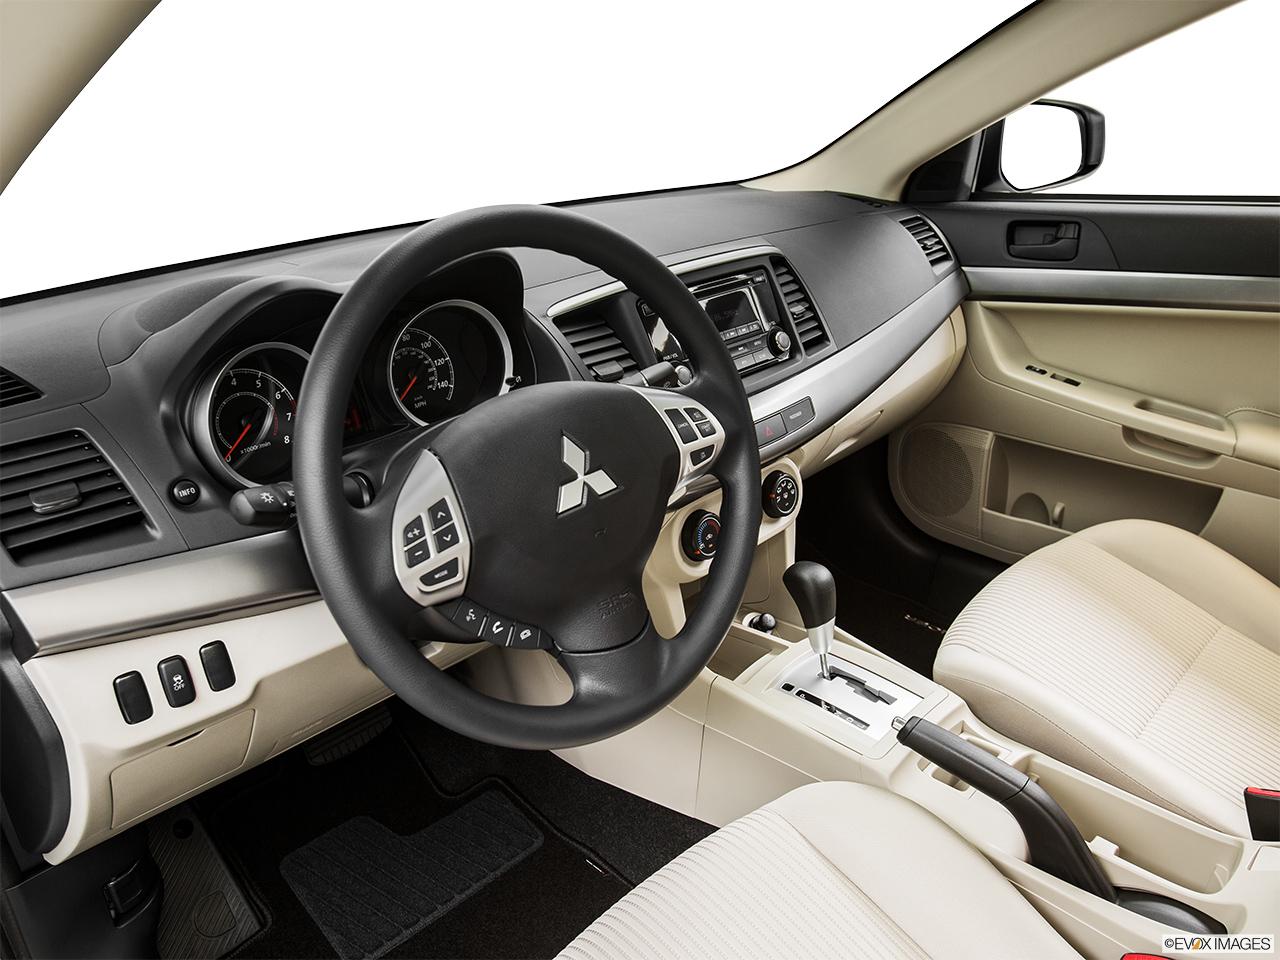 100 2015 Mitsubishi Outlander Interior 2011 Mitsubishi Outlander Sport Specs And Photos